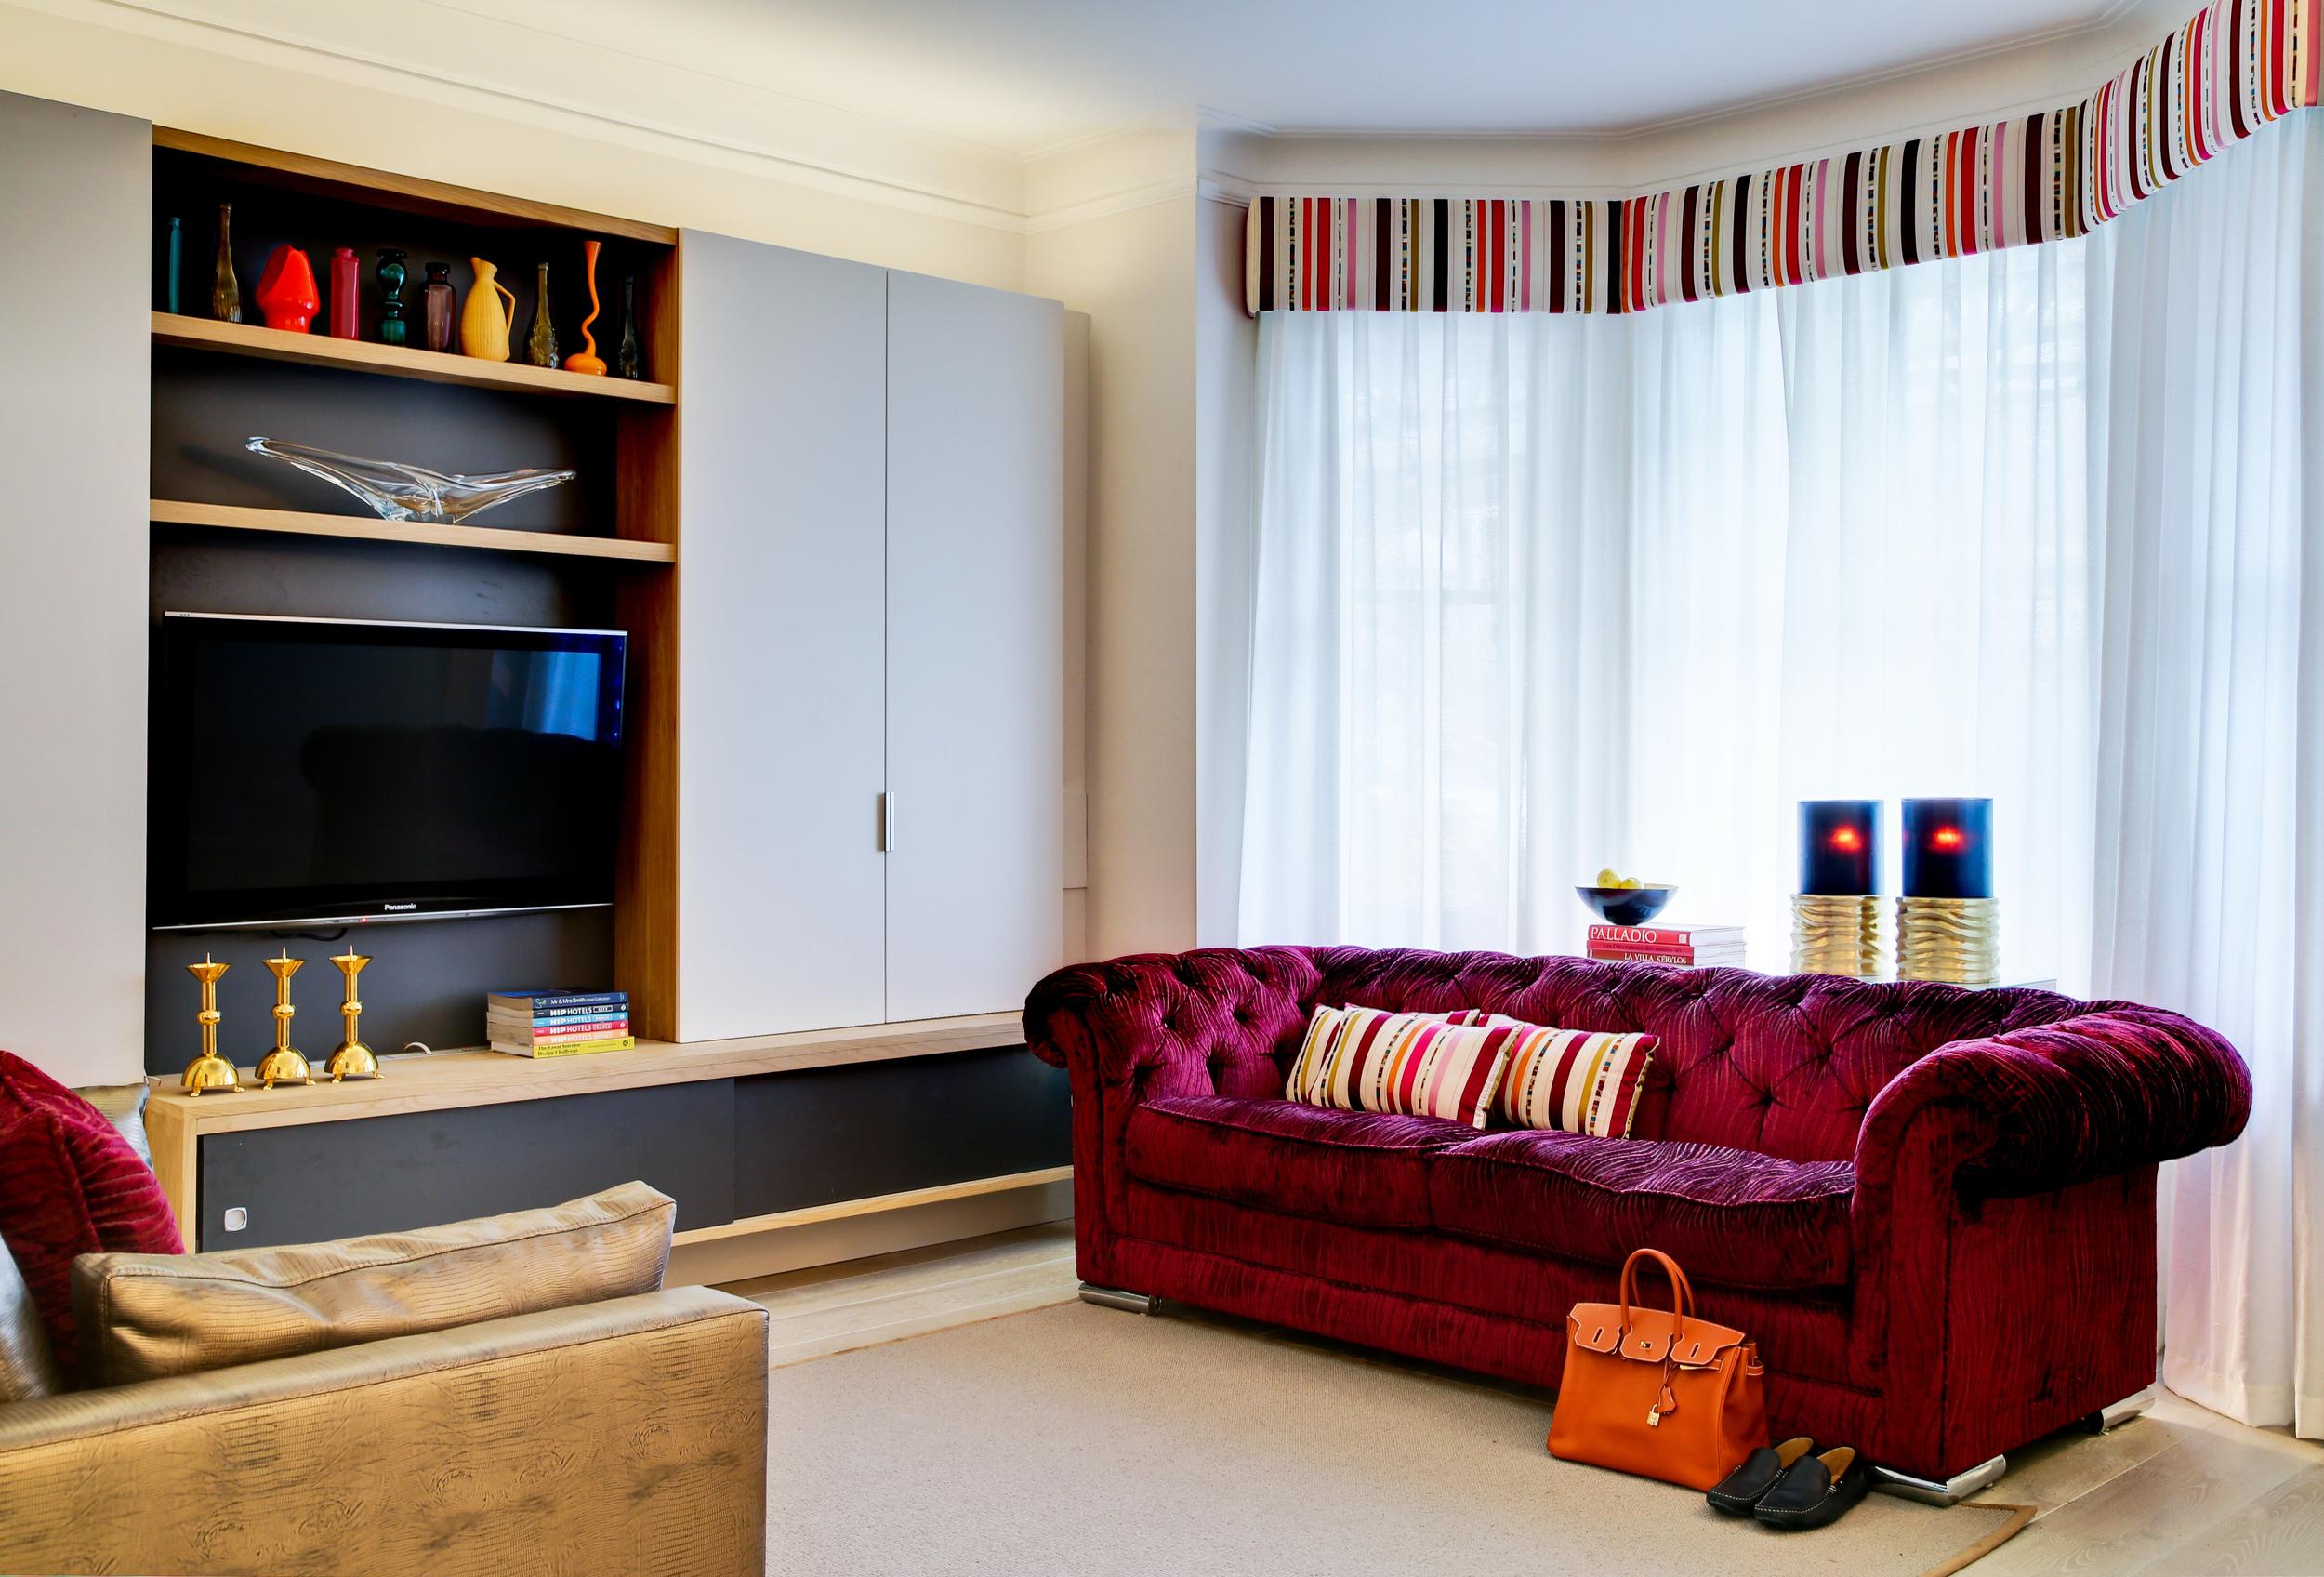 Dan Hopwood Maida Vale mattchungphoto hi-res (26).jpg